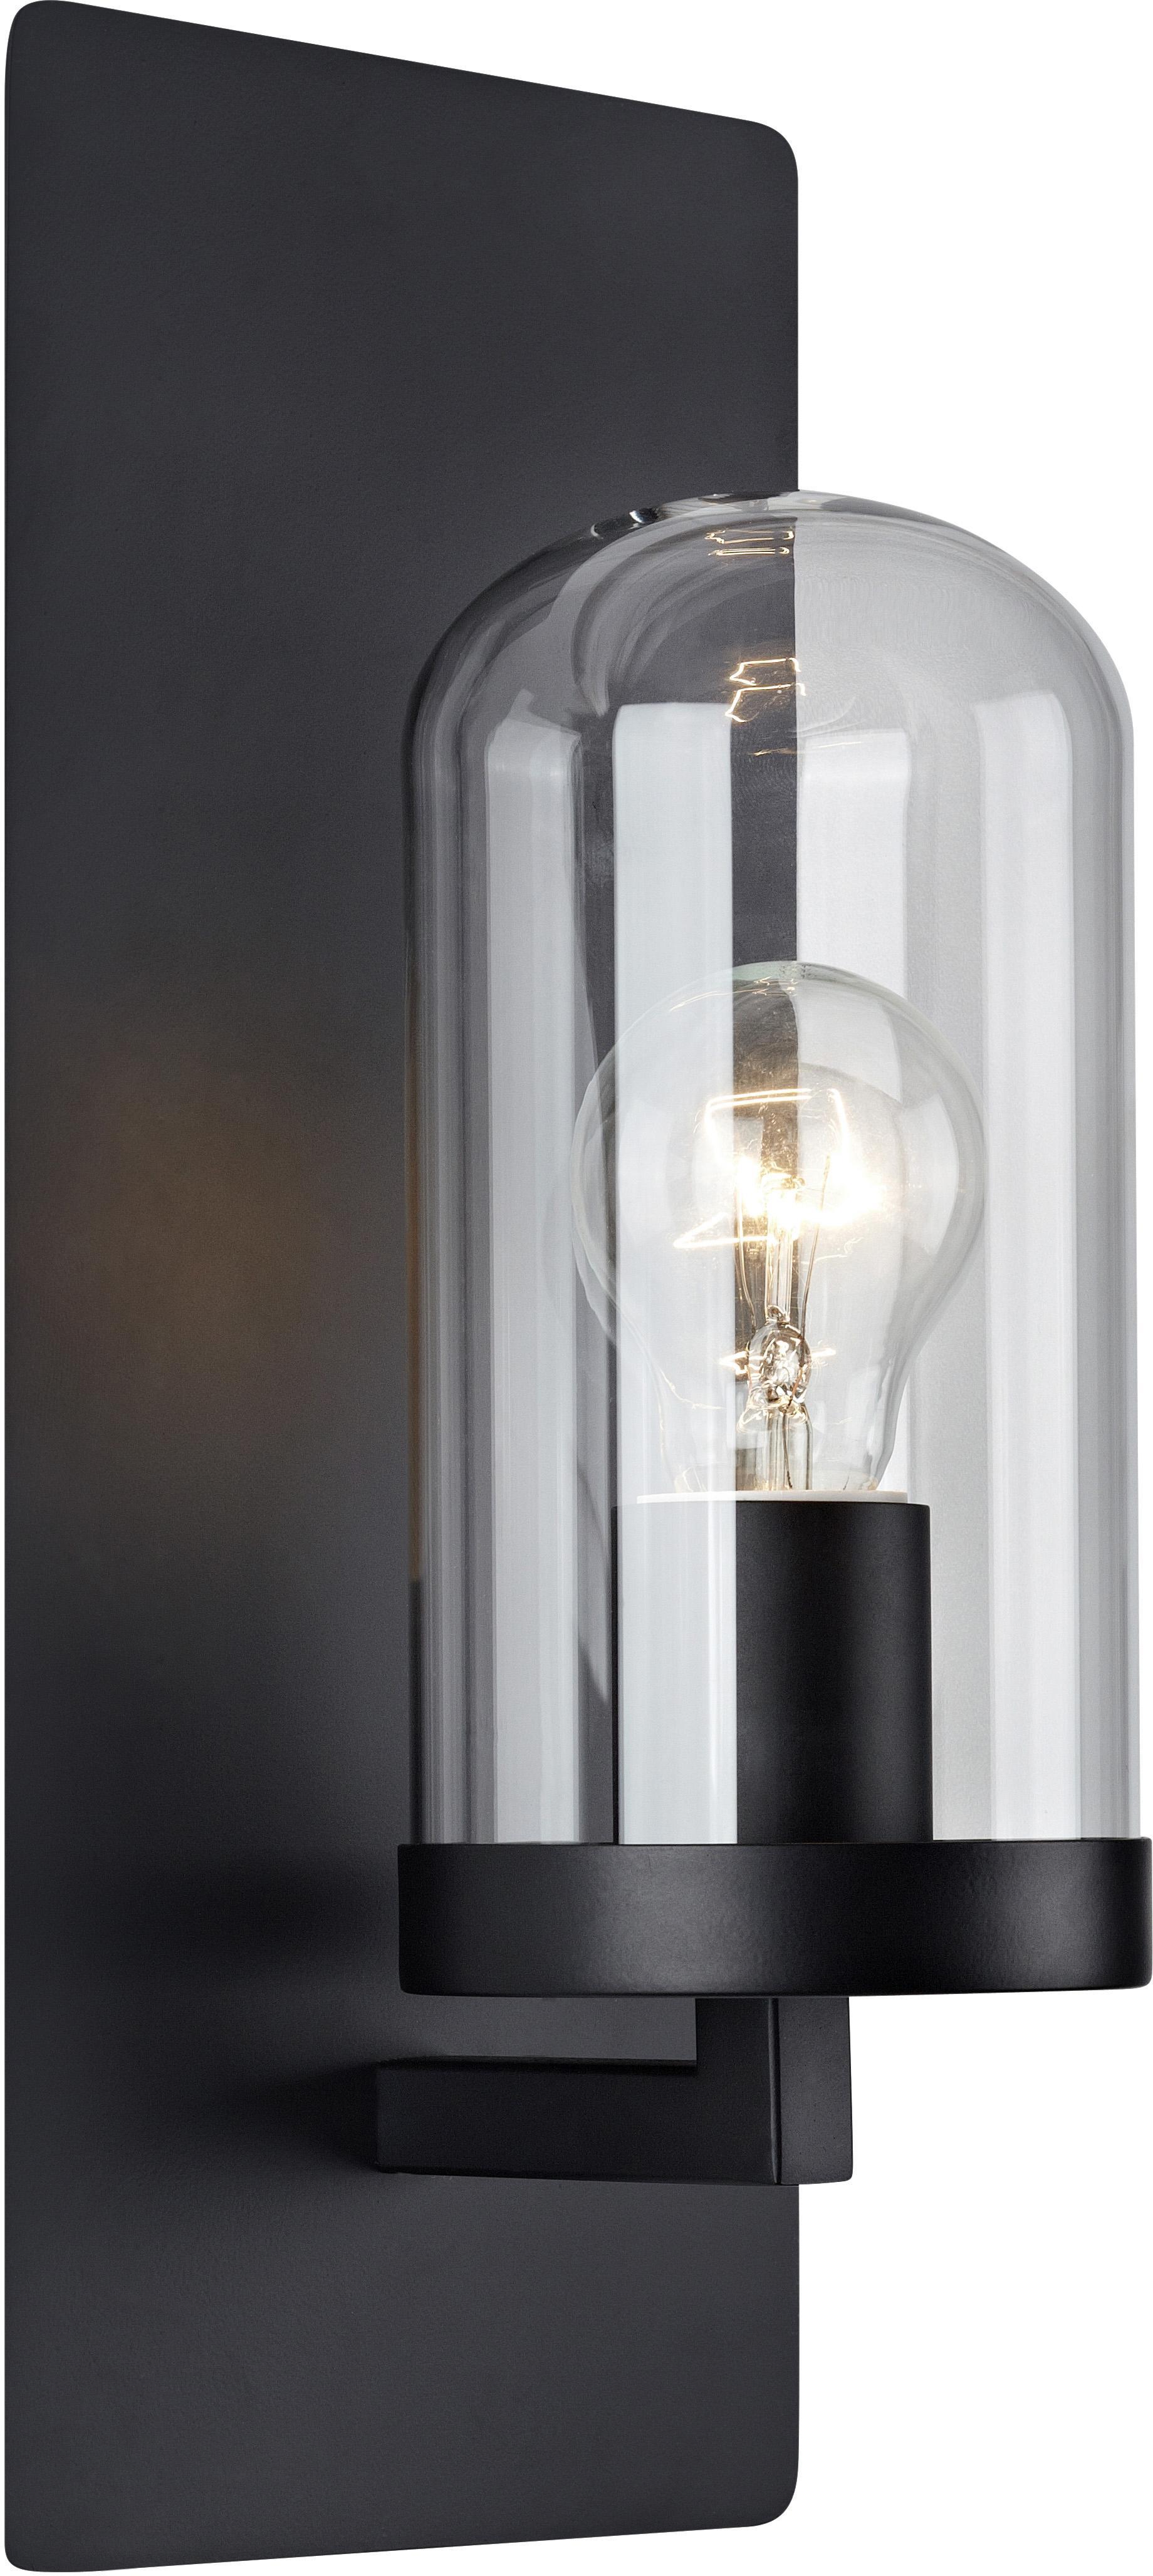 Aplique Barnaby, con enchufe, Urna: vidrio, Negro, An 15 x Al 35 cm